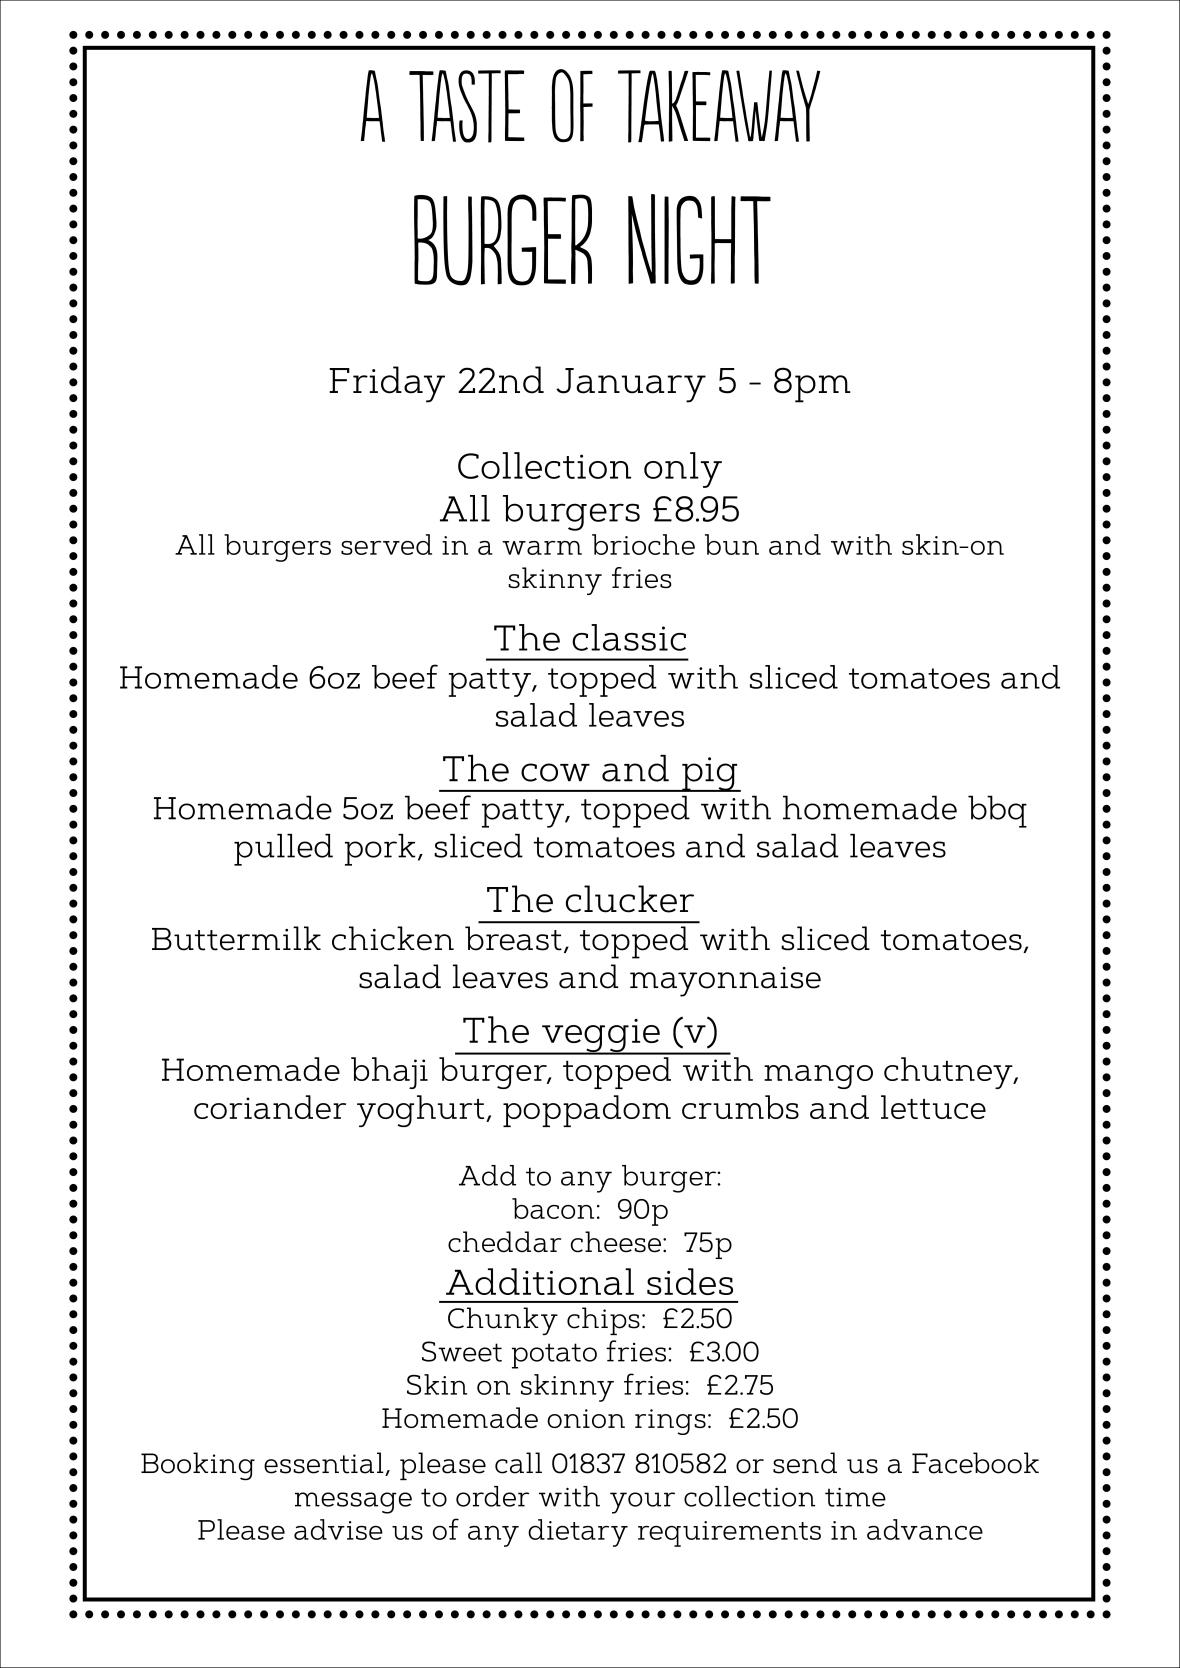 A Taste of takeaway burger night Jan 21